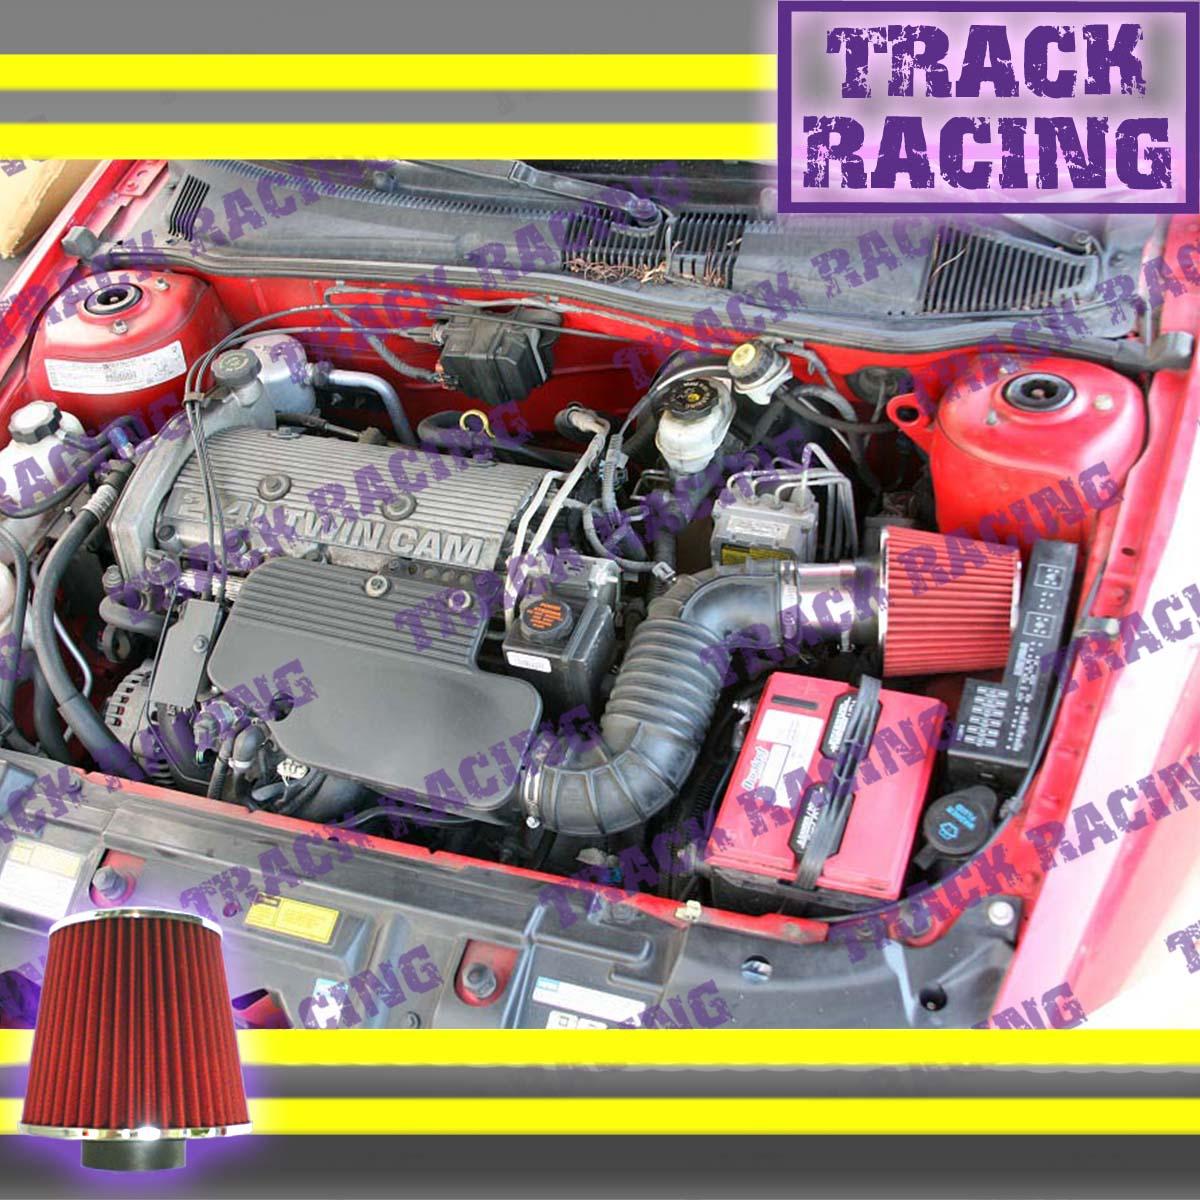 1996 Chevrolet Corsica Camshaft: 1996 CHEVY BERETTA/CHEVROLET CORSICA 3.1L V6 AIR INTAKE